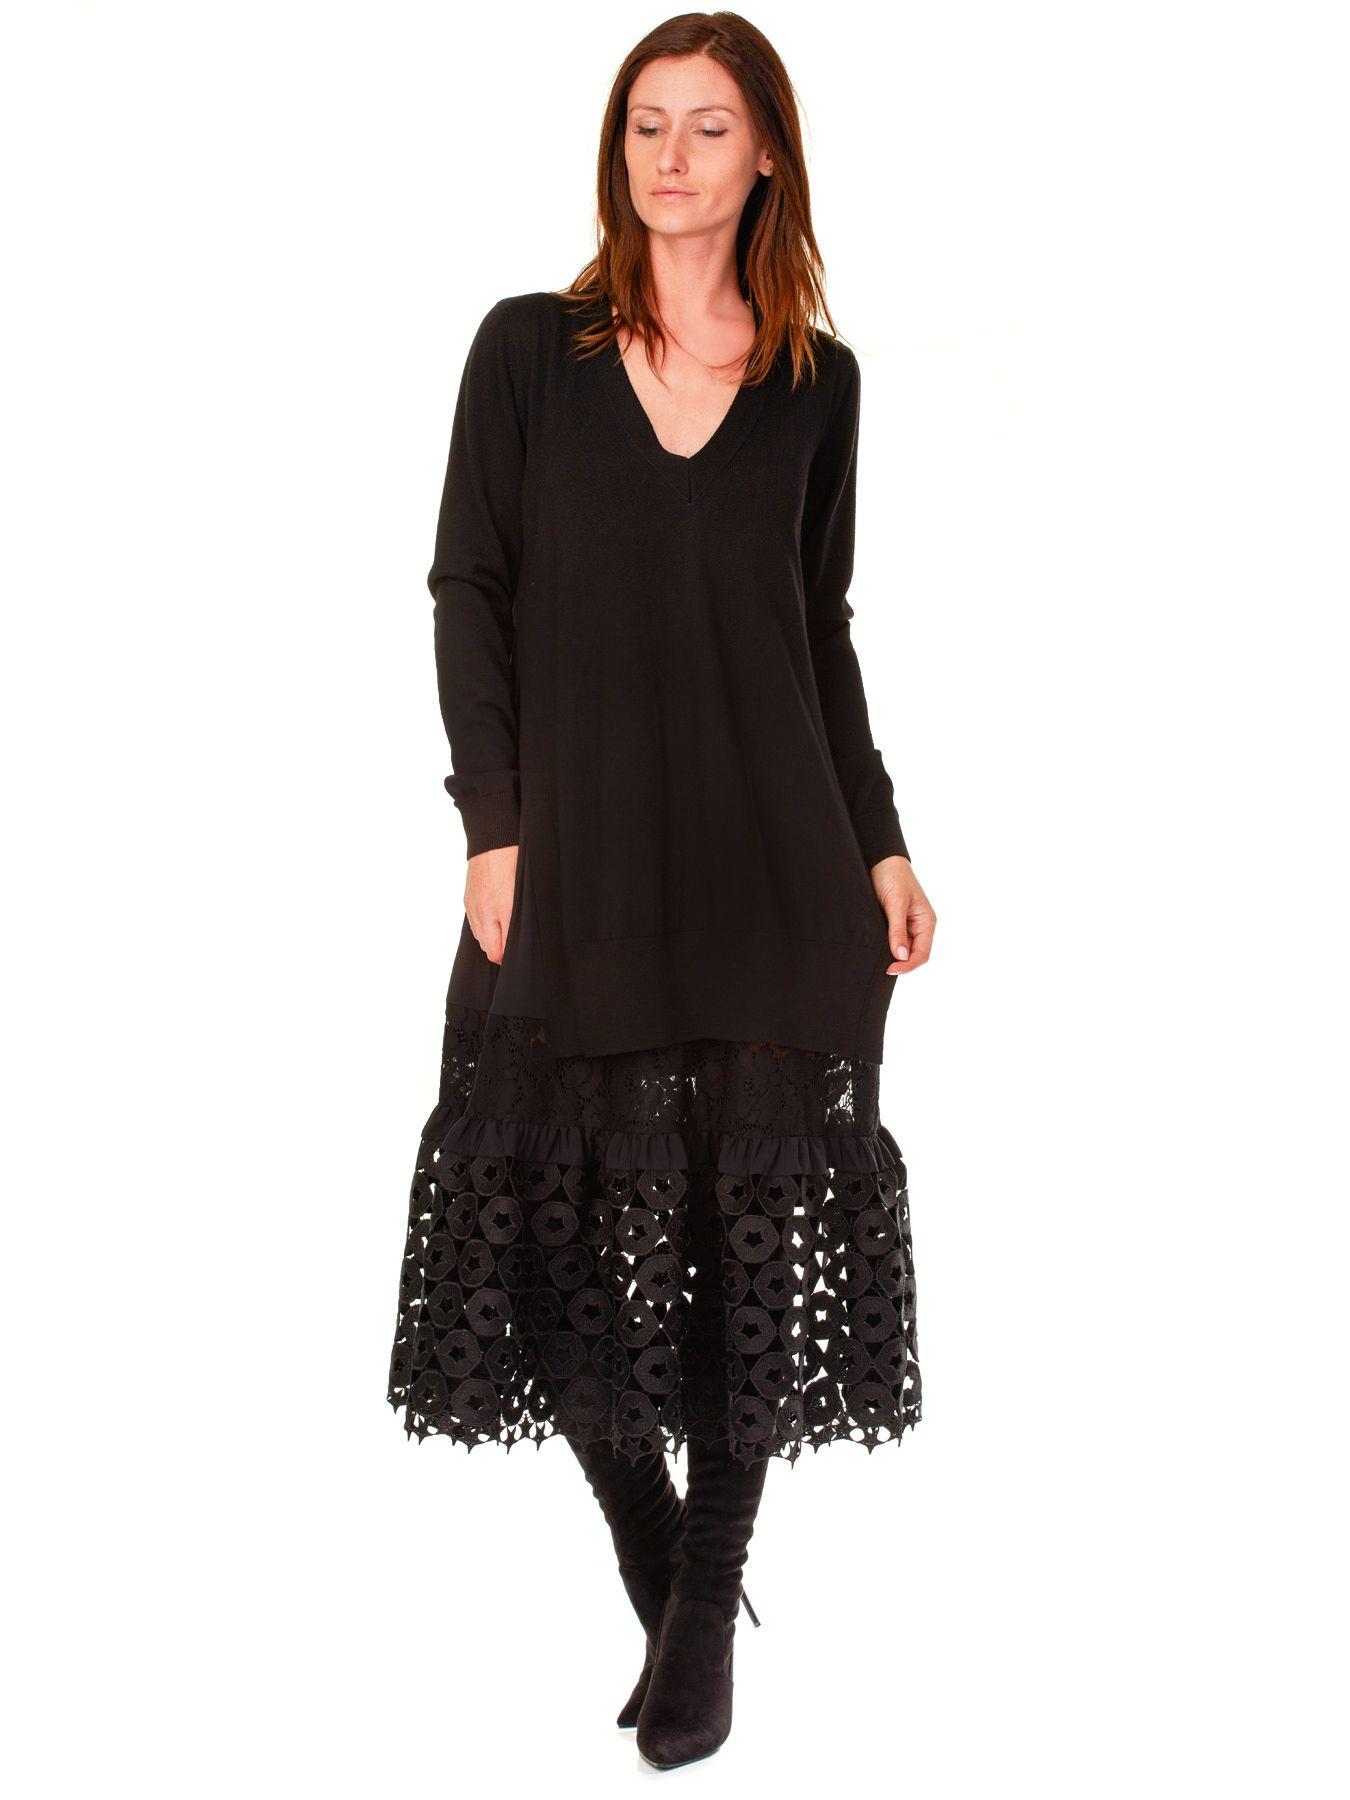 N.21 Knit Dress